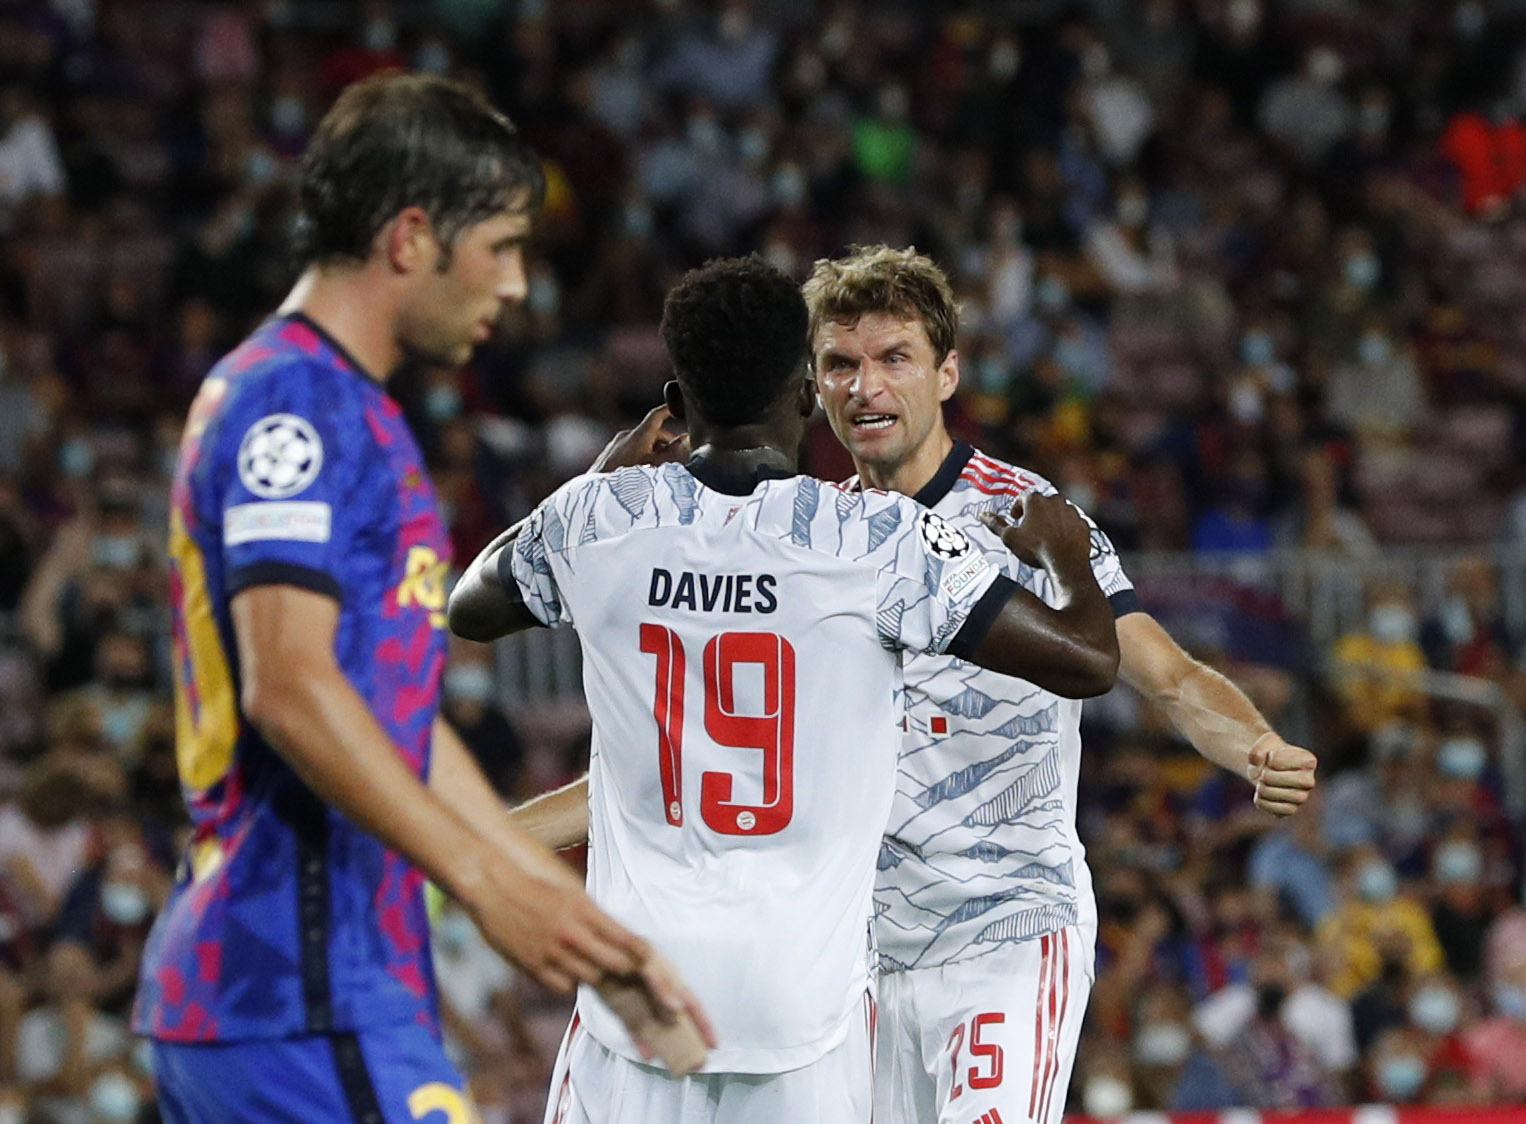 Champions League, Μπαρτσελόνα – Μπάγερν Μονάχου 0-3: Βαυαρικό πάρτι στη Βαρκελώνη